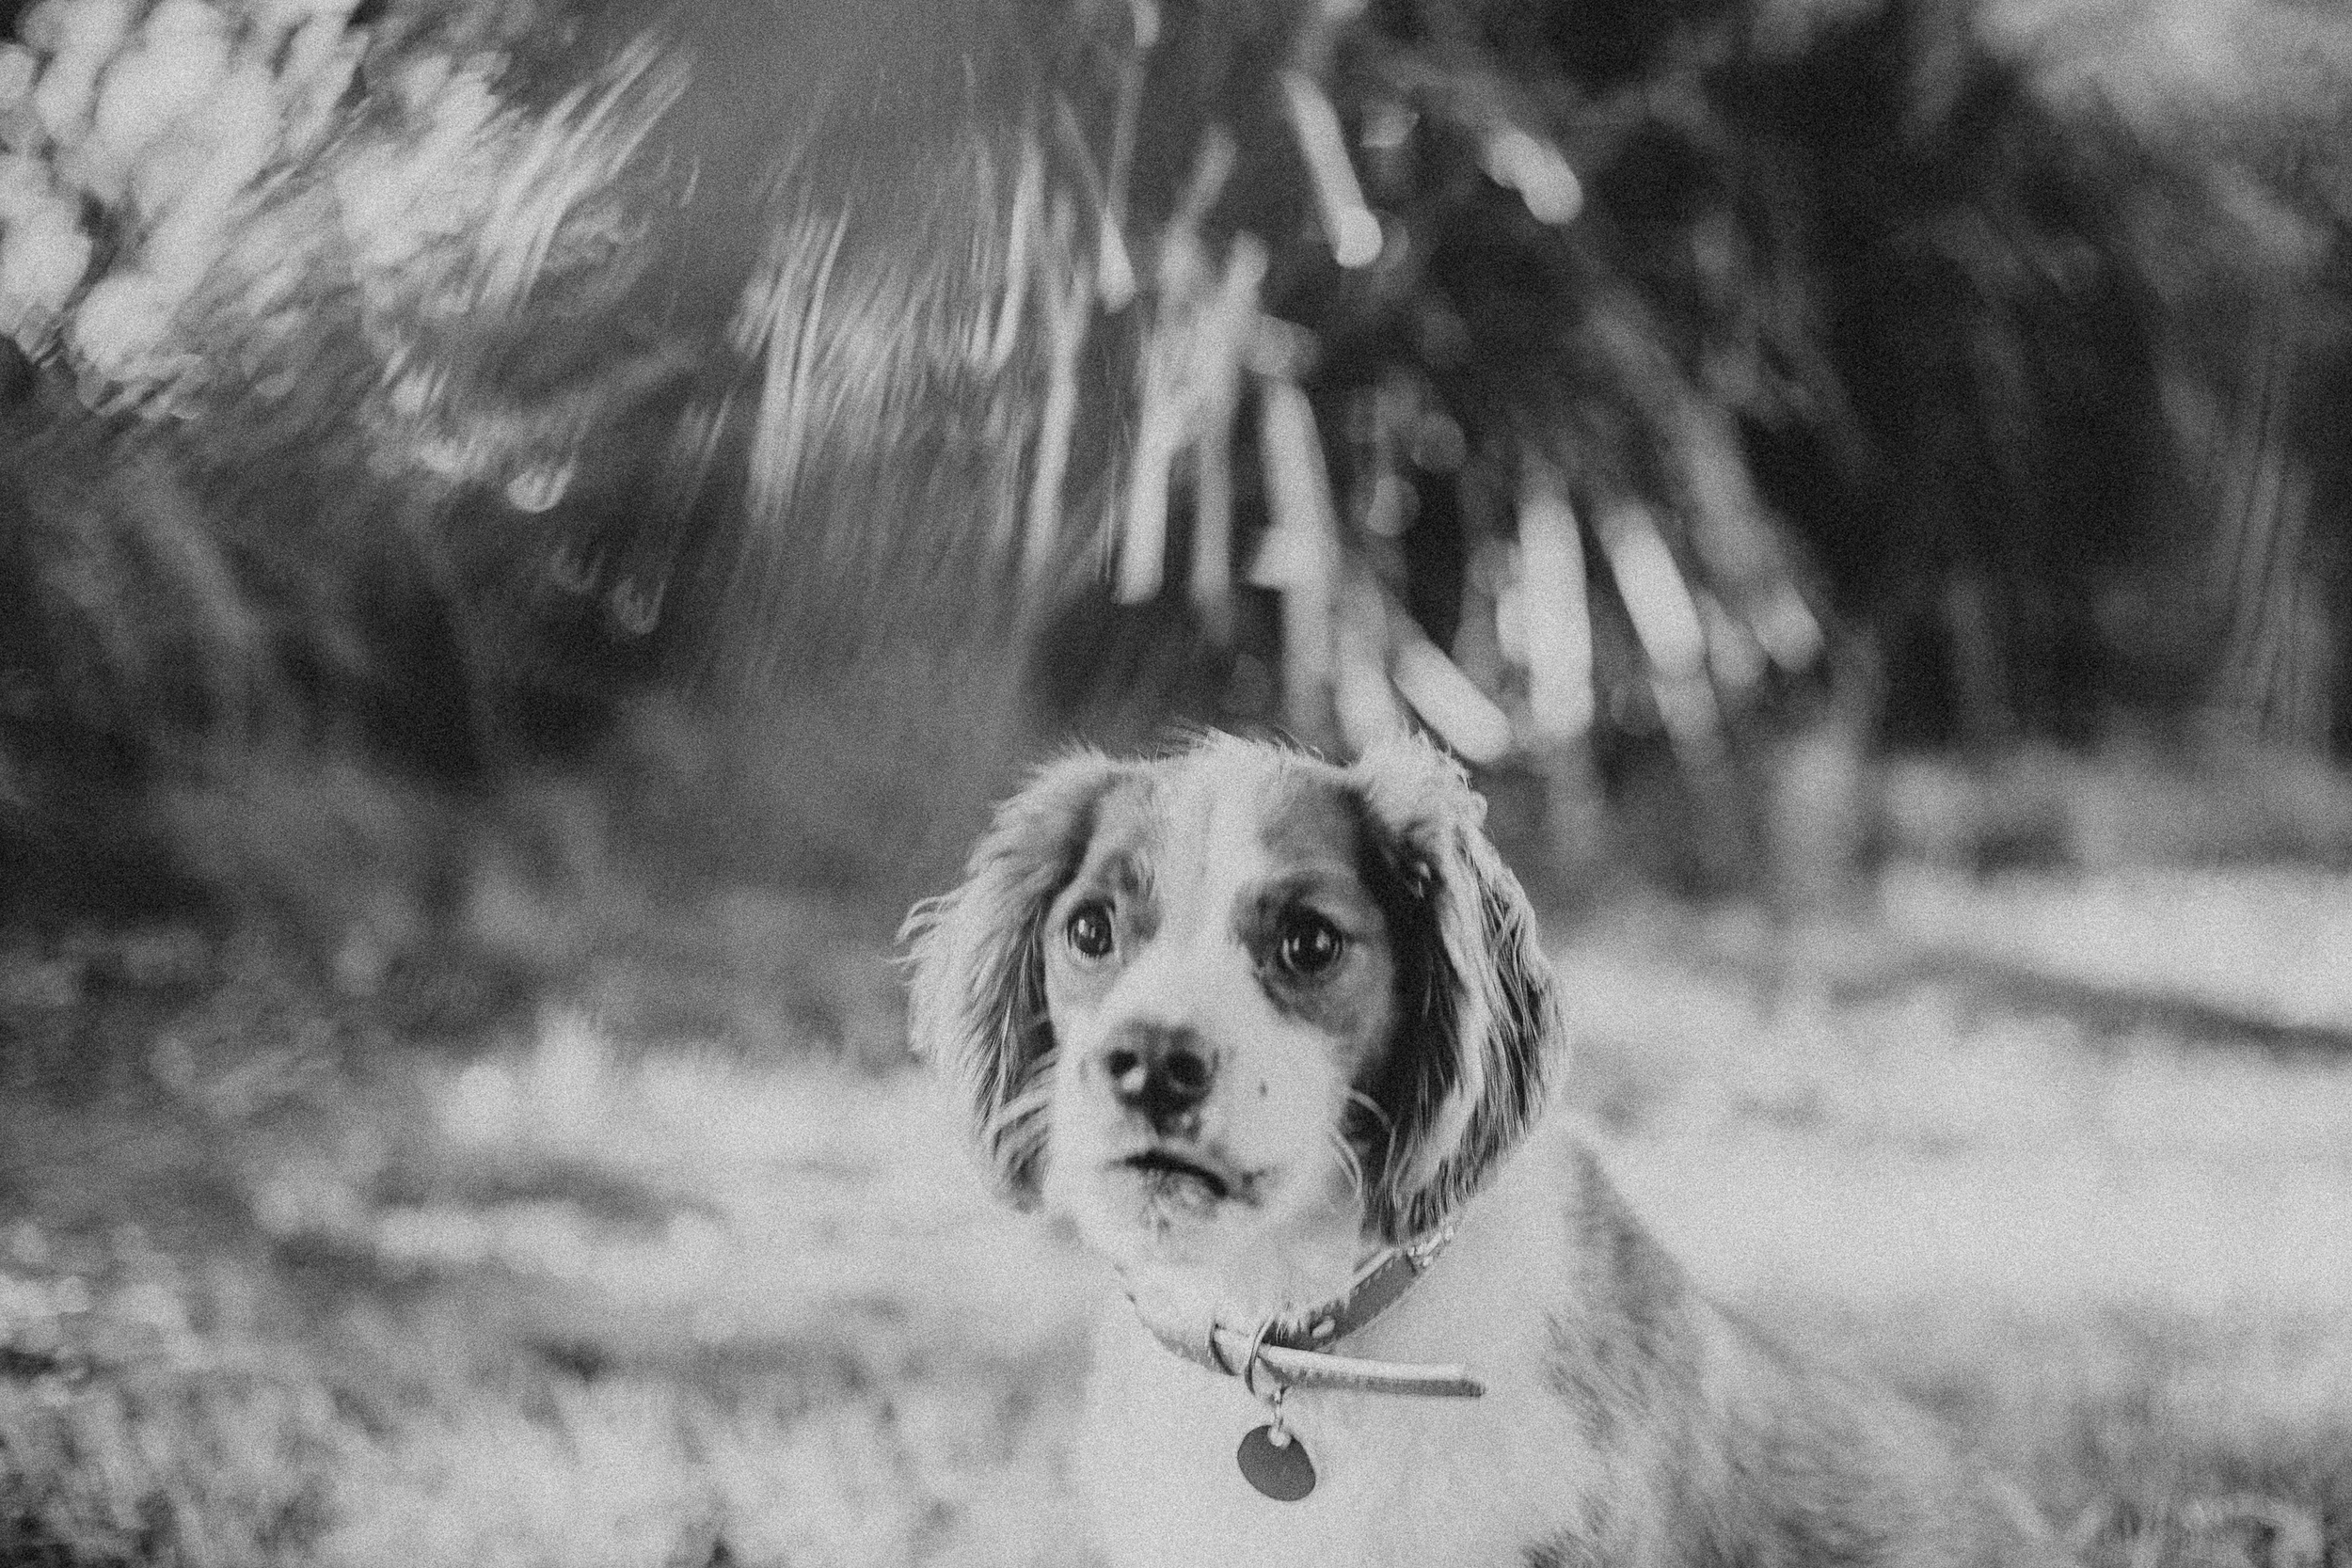 twoguineapigs_pet_photography_loki_beagle_x_kings_charles_nicola_scott_coleman_3000-2.jpg